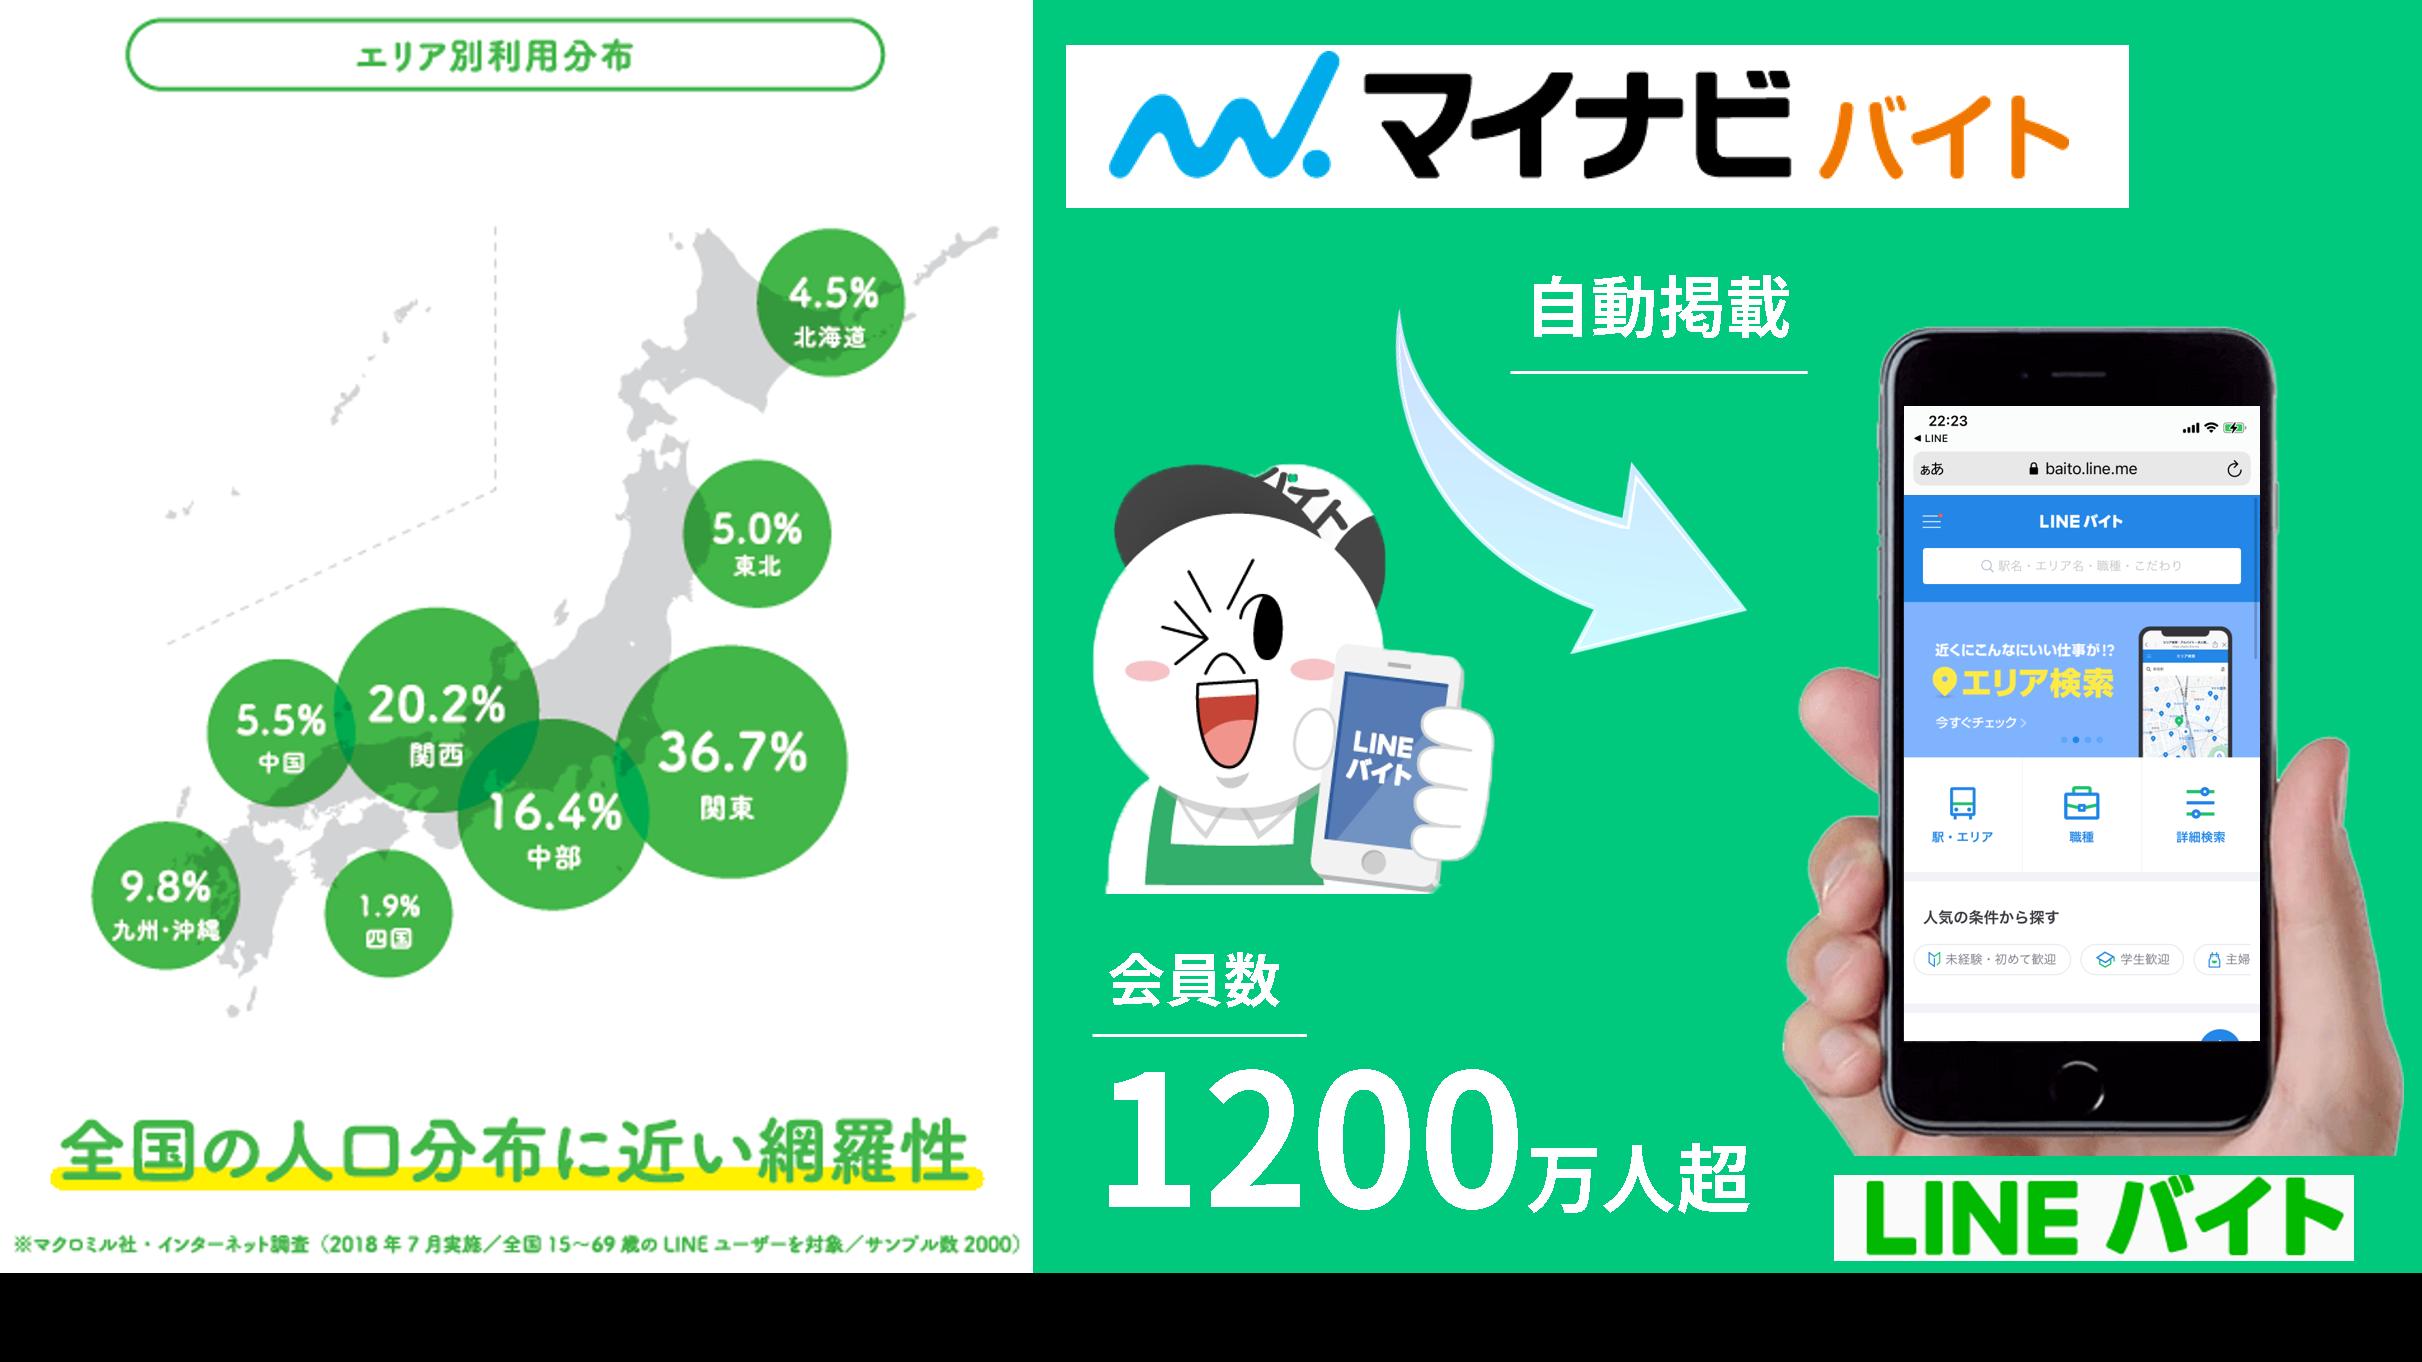 「LINEバイト」にも無料同時掲載!